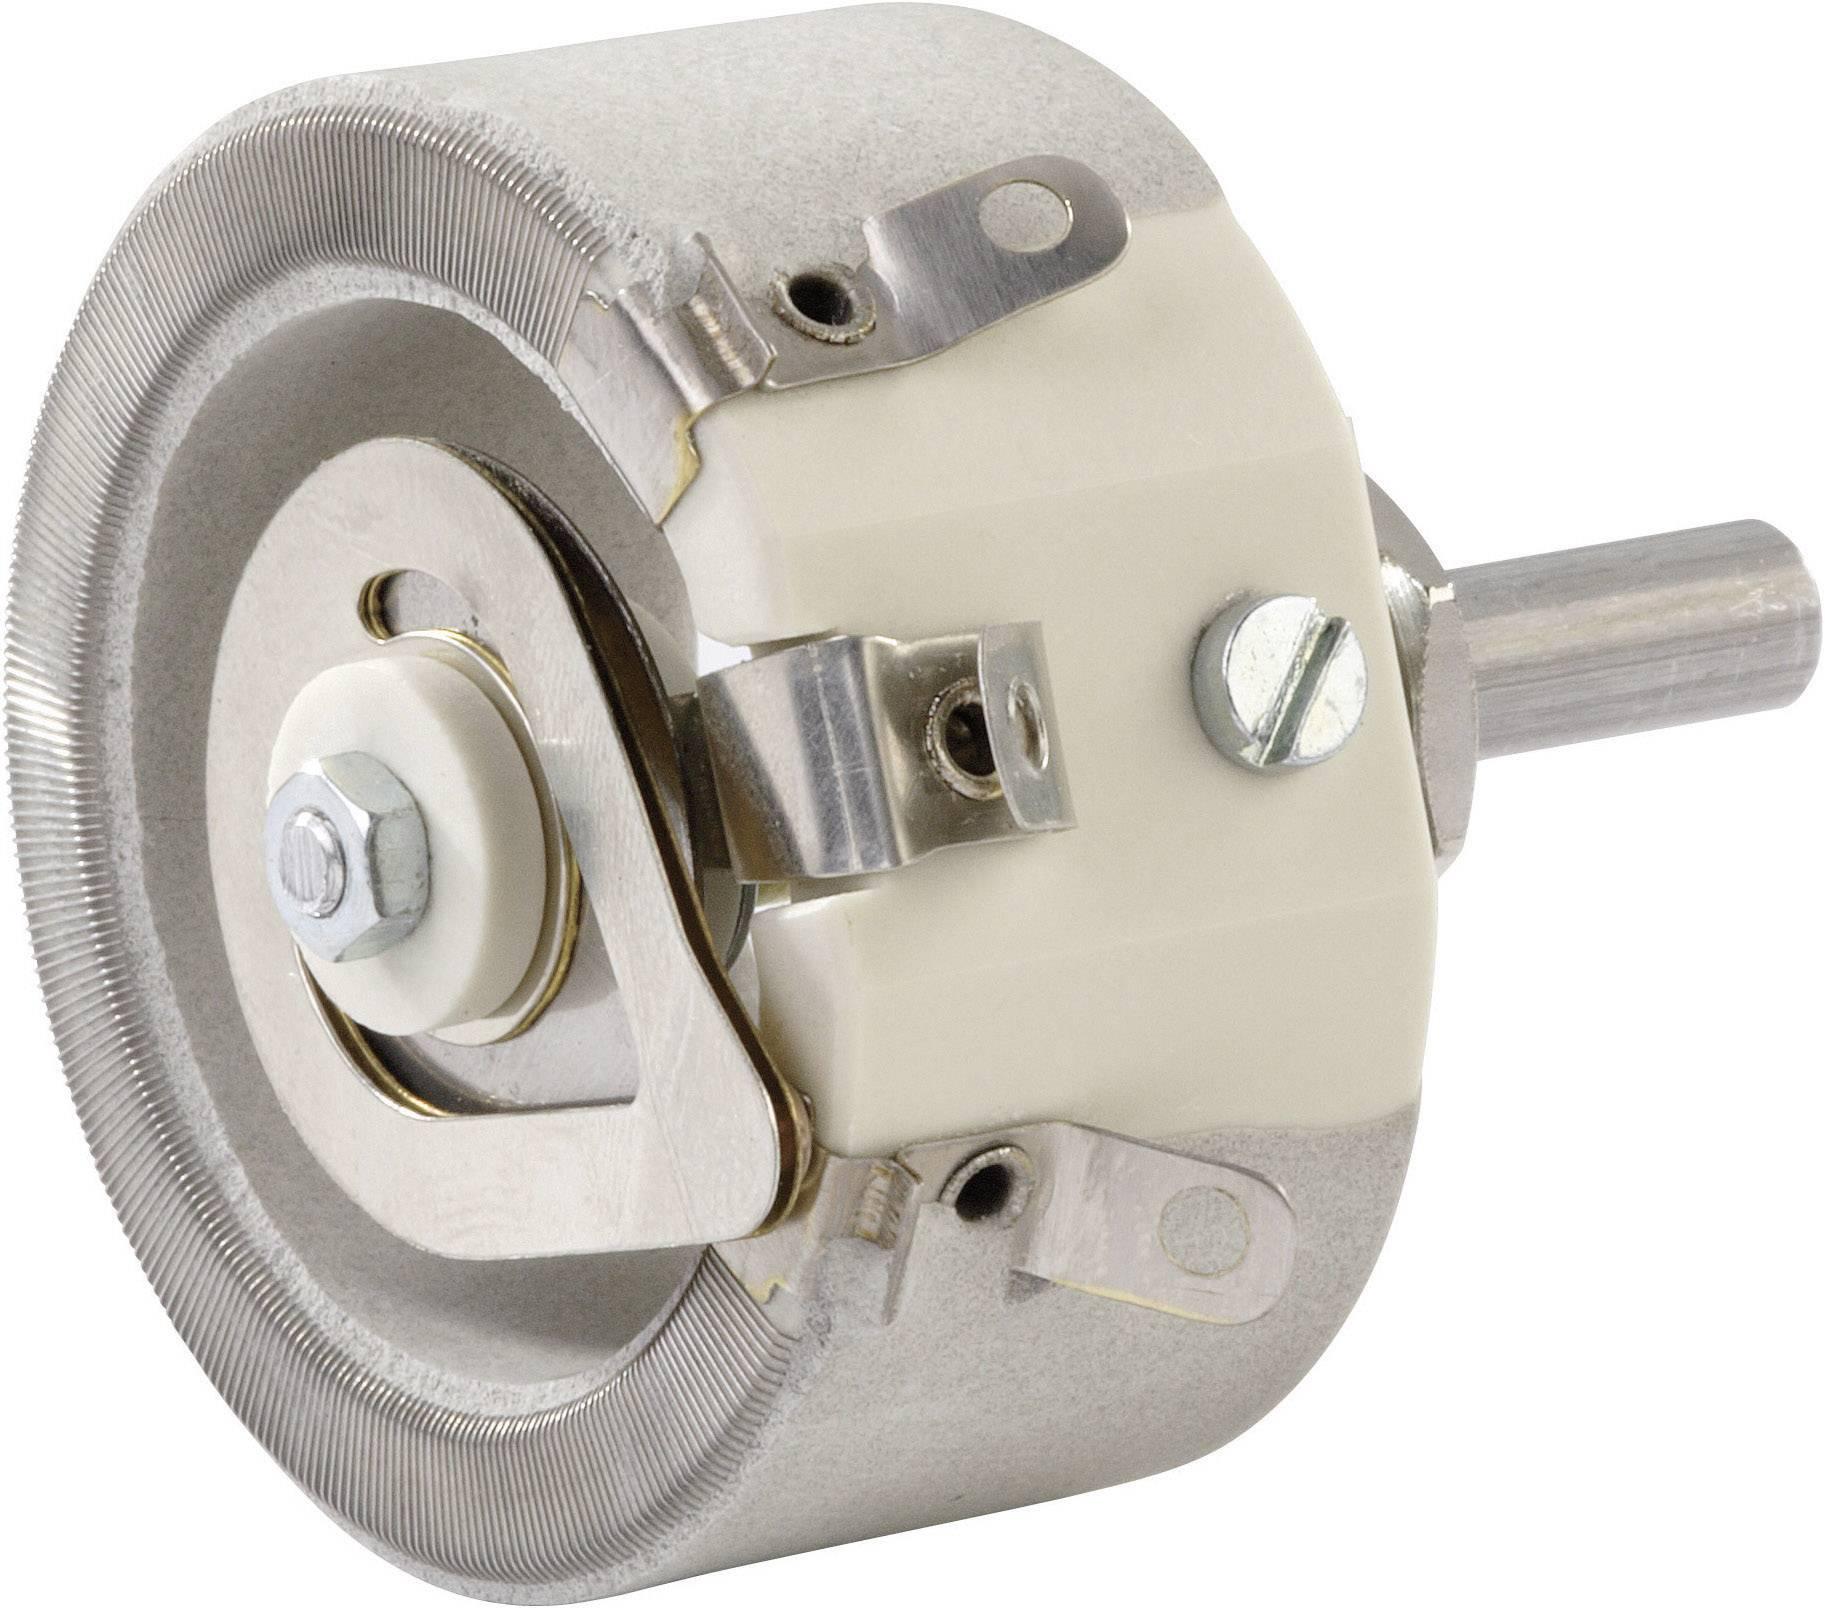 Drôtový potenciometer mono TT Electronics AB 3191102700 3191102700, 30 W, 22 Ohm, 1 ks